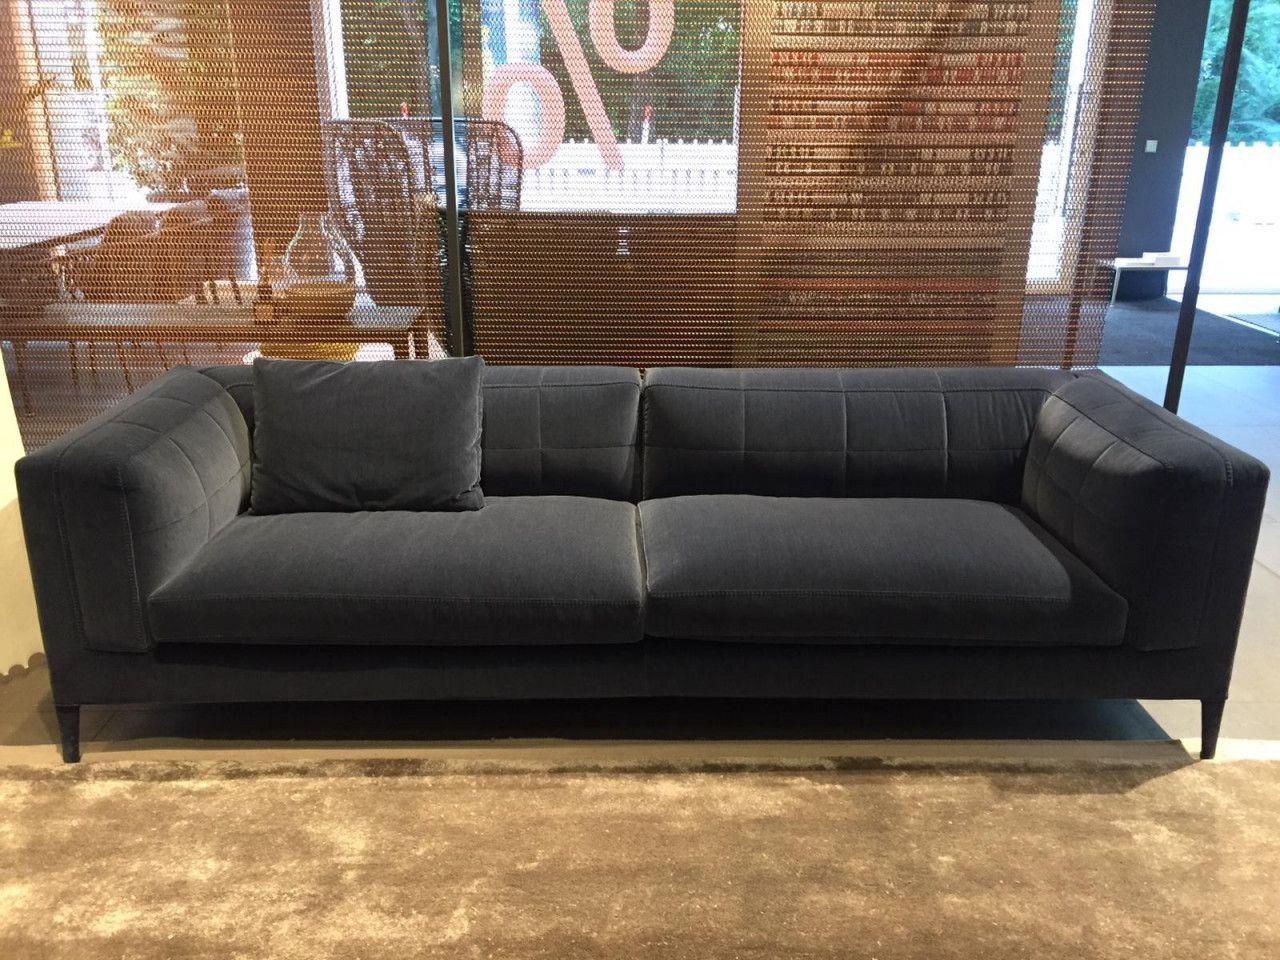 Sofa Dives Aus Der Maxalto Kollektion Von Bebitalia Mit